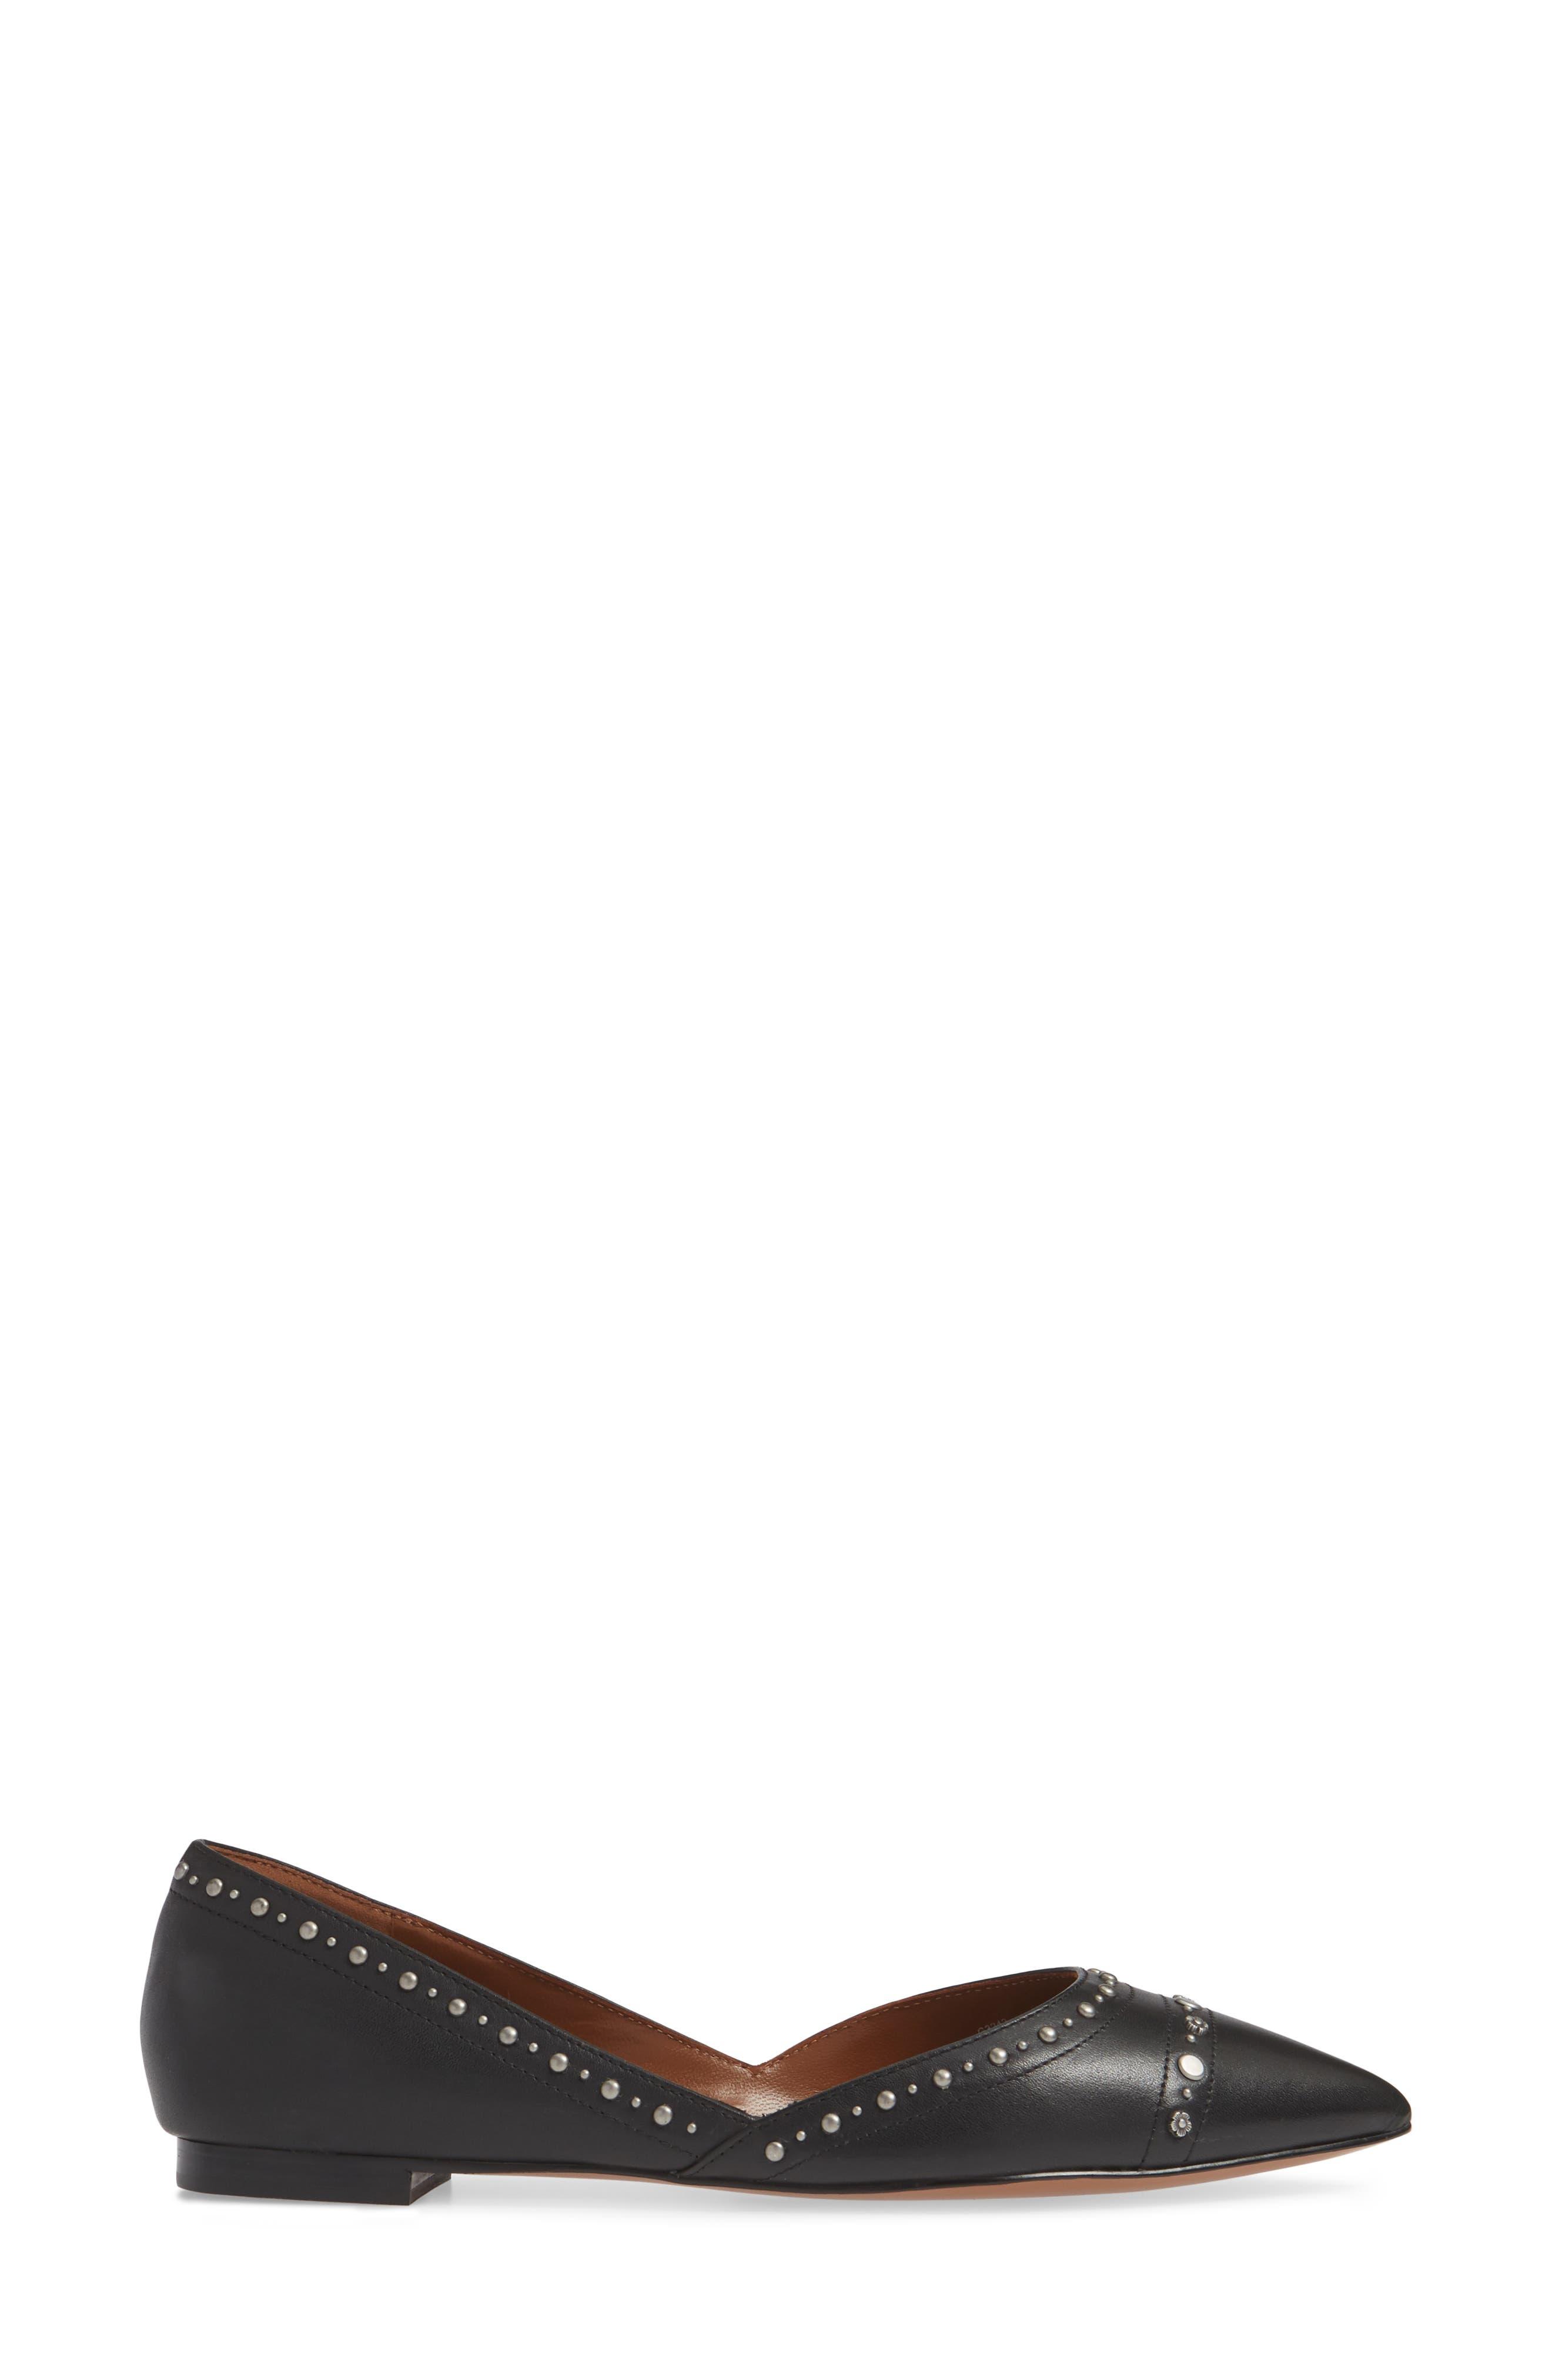 Valintina Pointed Toe Flat,                             Alternate thumbnail 3, color,                             BLACK LEATHER